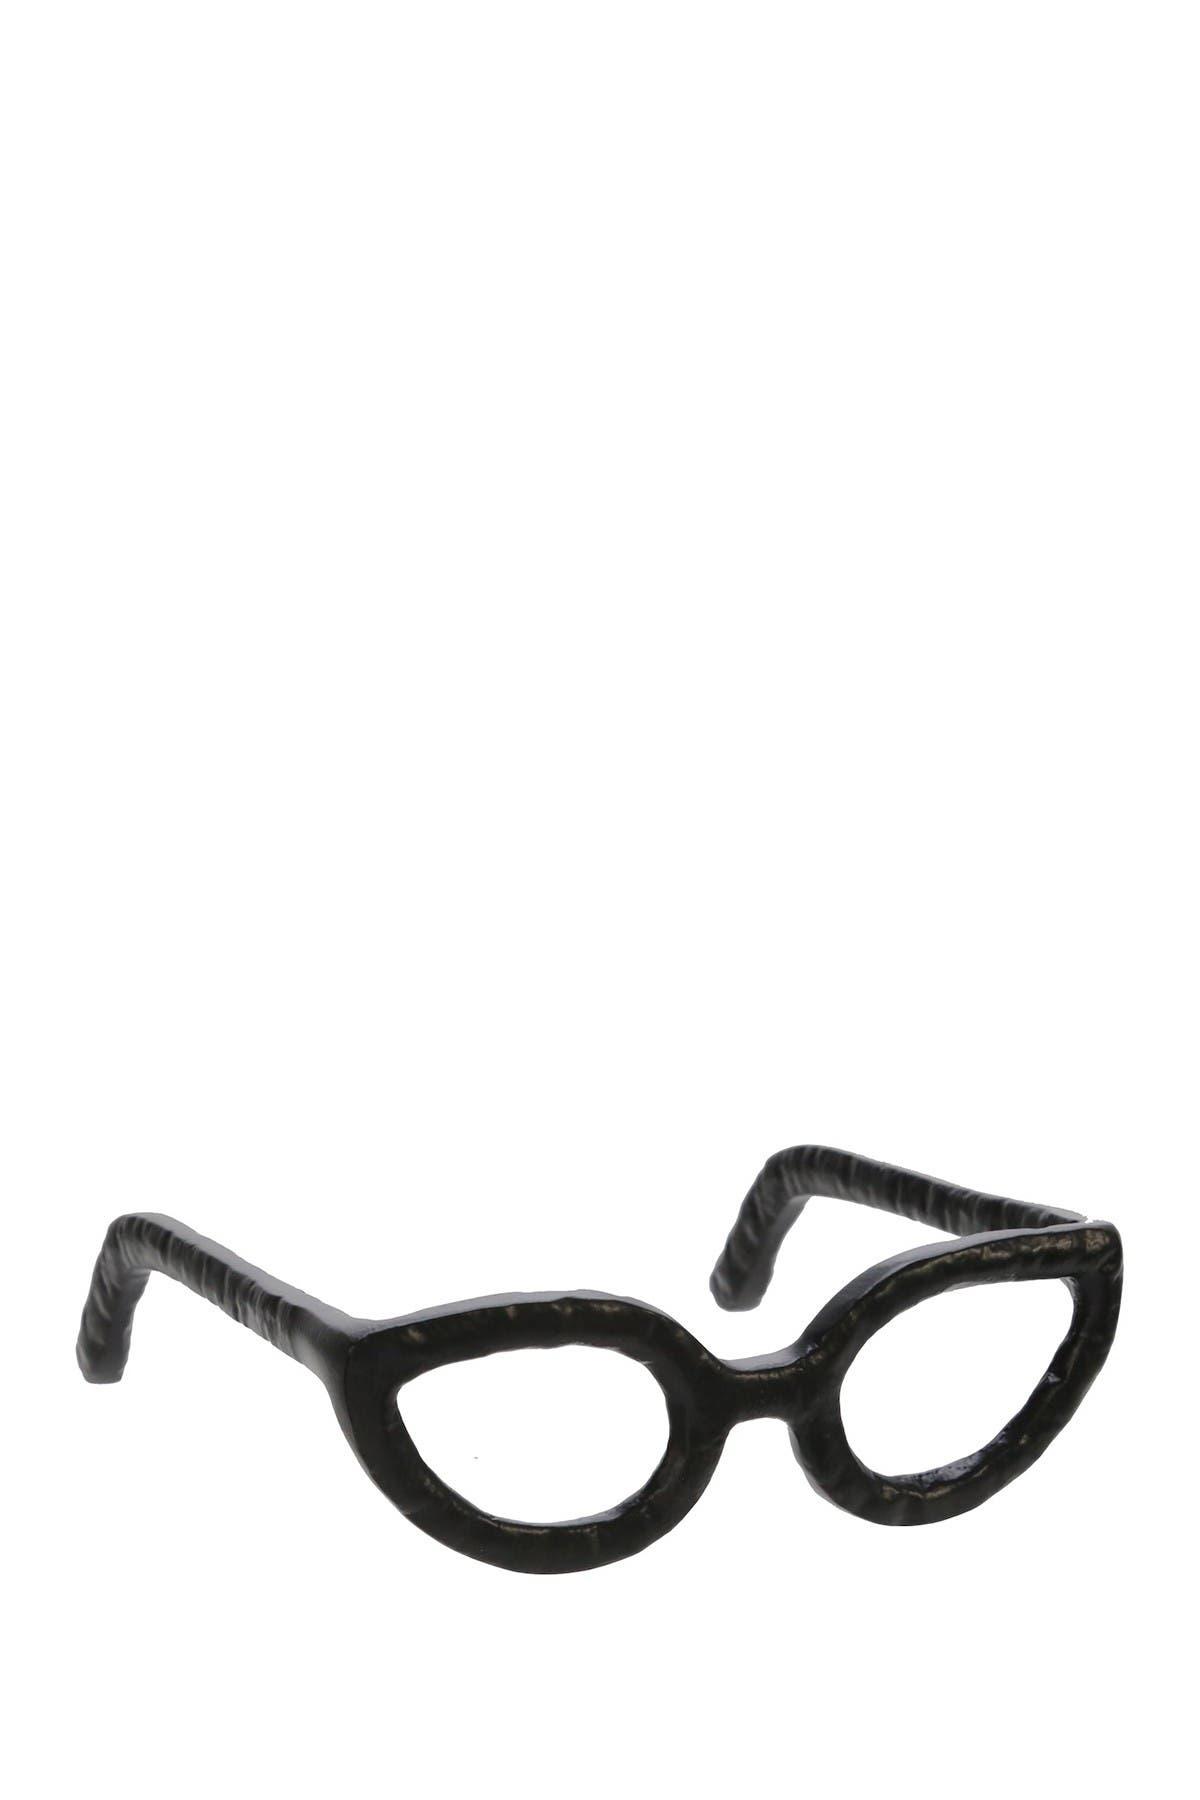 Image of SAGEBROOK HOME Aluminum Glasses Sculpture - Black